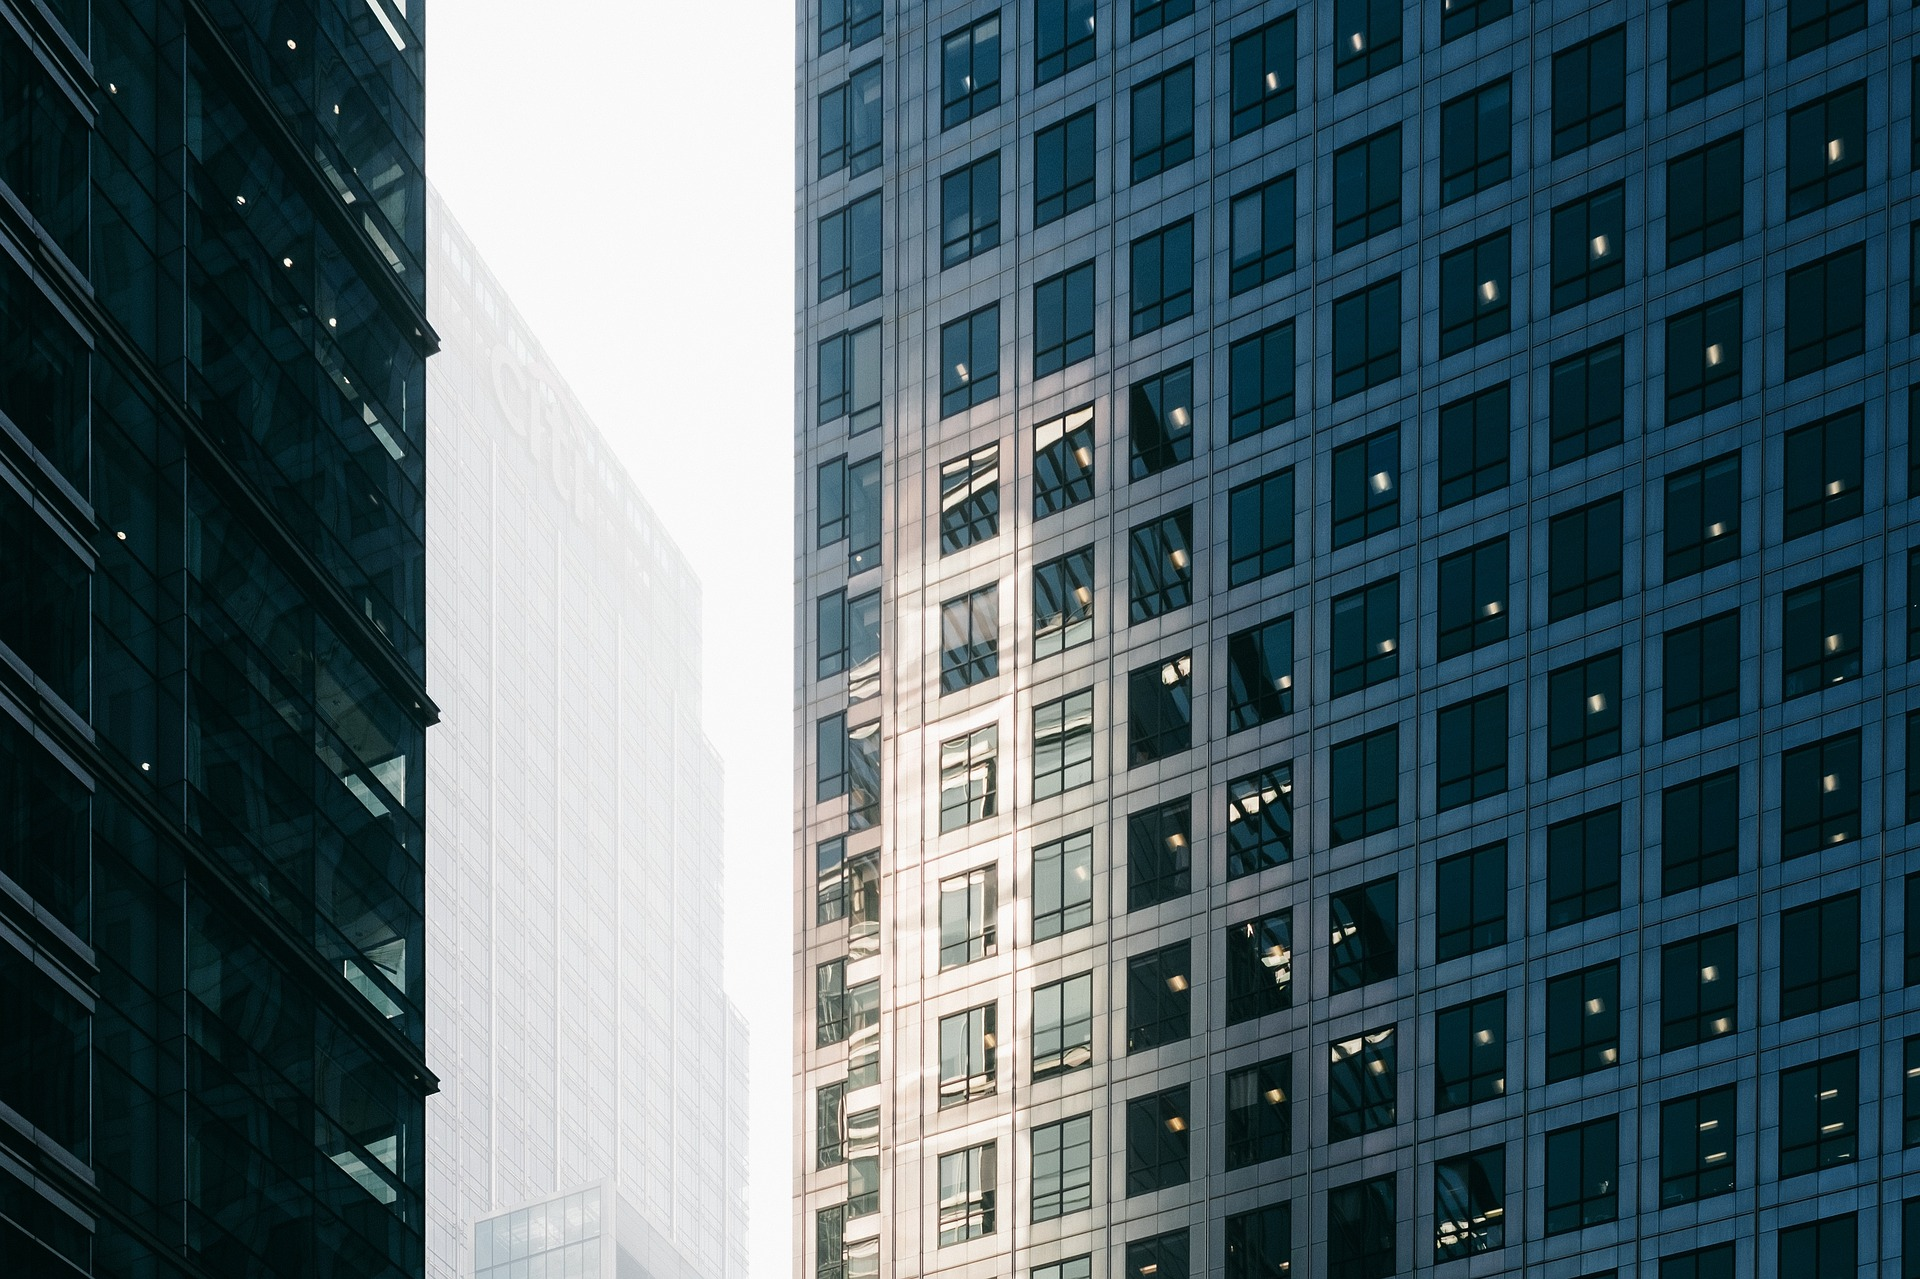 Buildings Windows Office Architecture Corporate